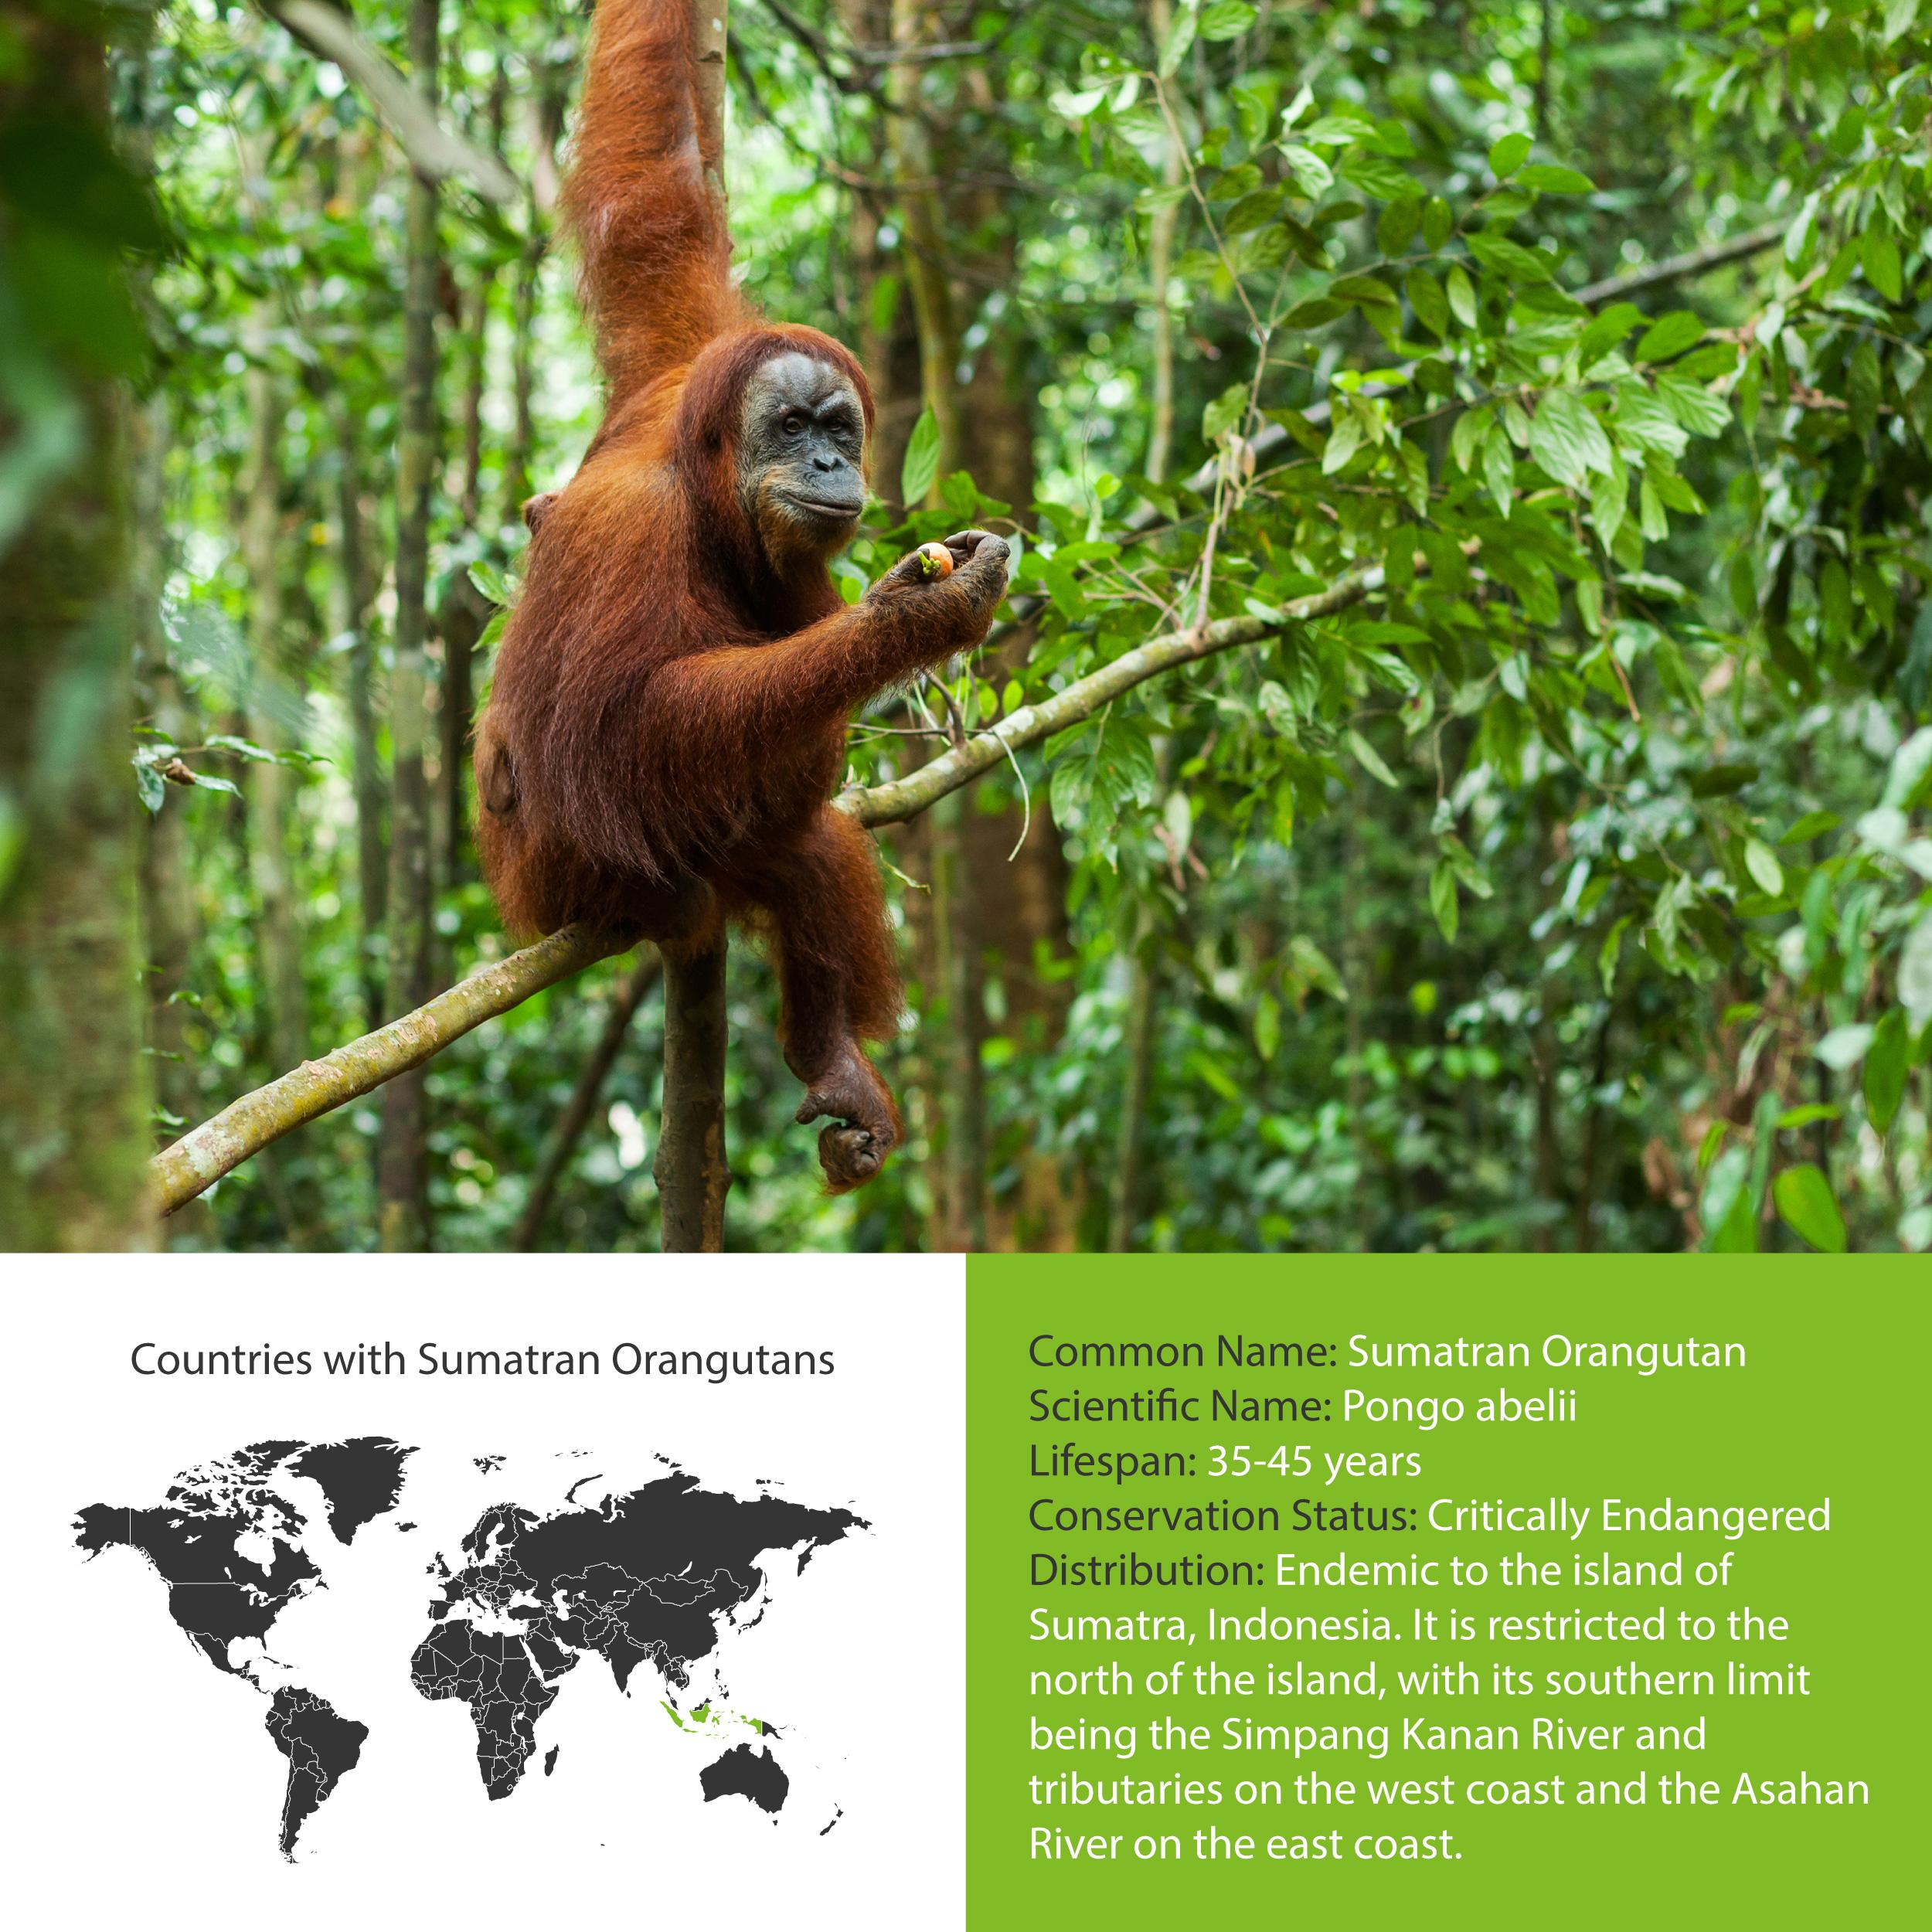 Sumatran Orangutan Distribution